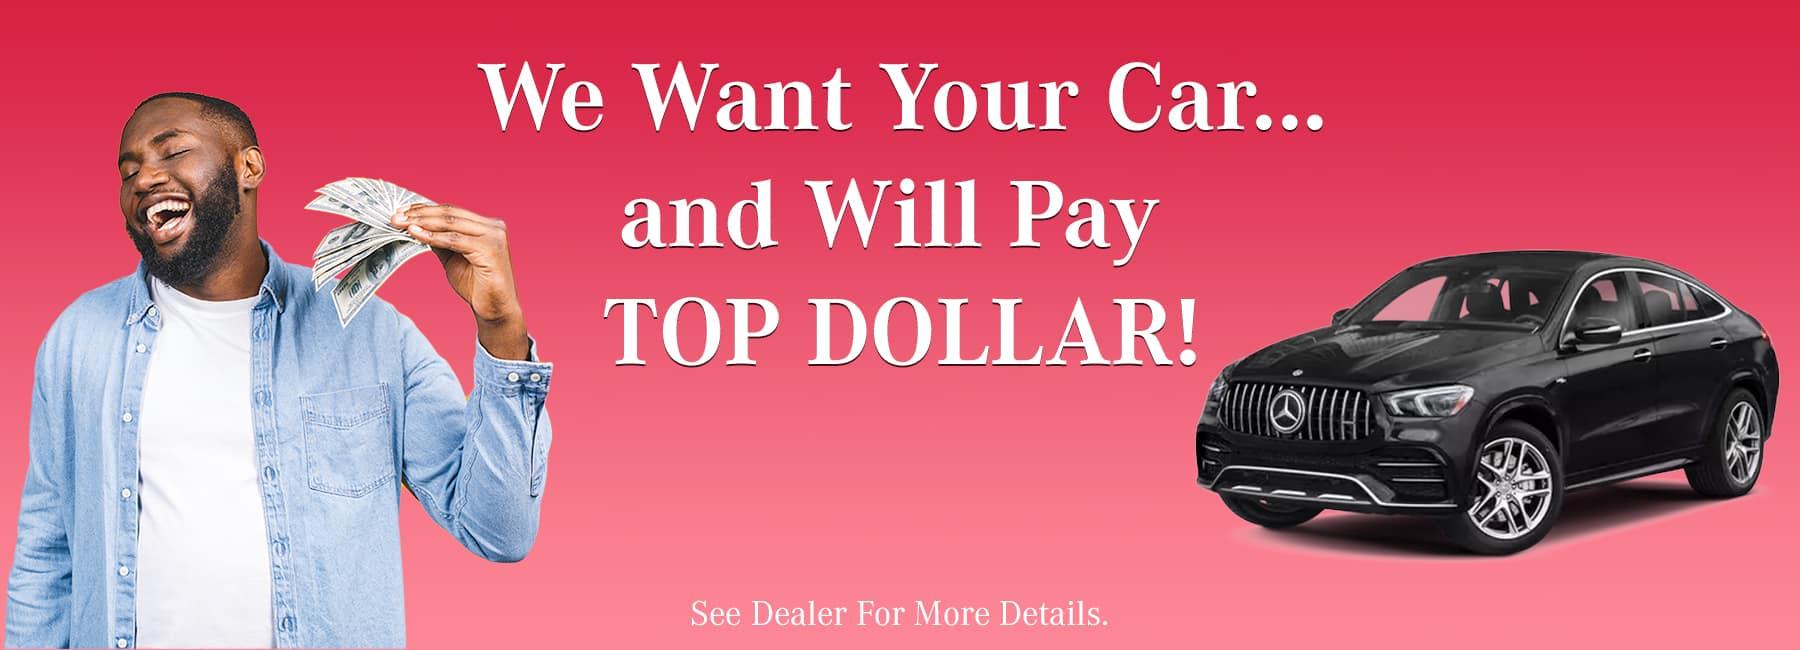 MB Flagstaff_HP_Buy your car_1800x650